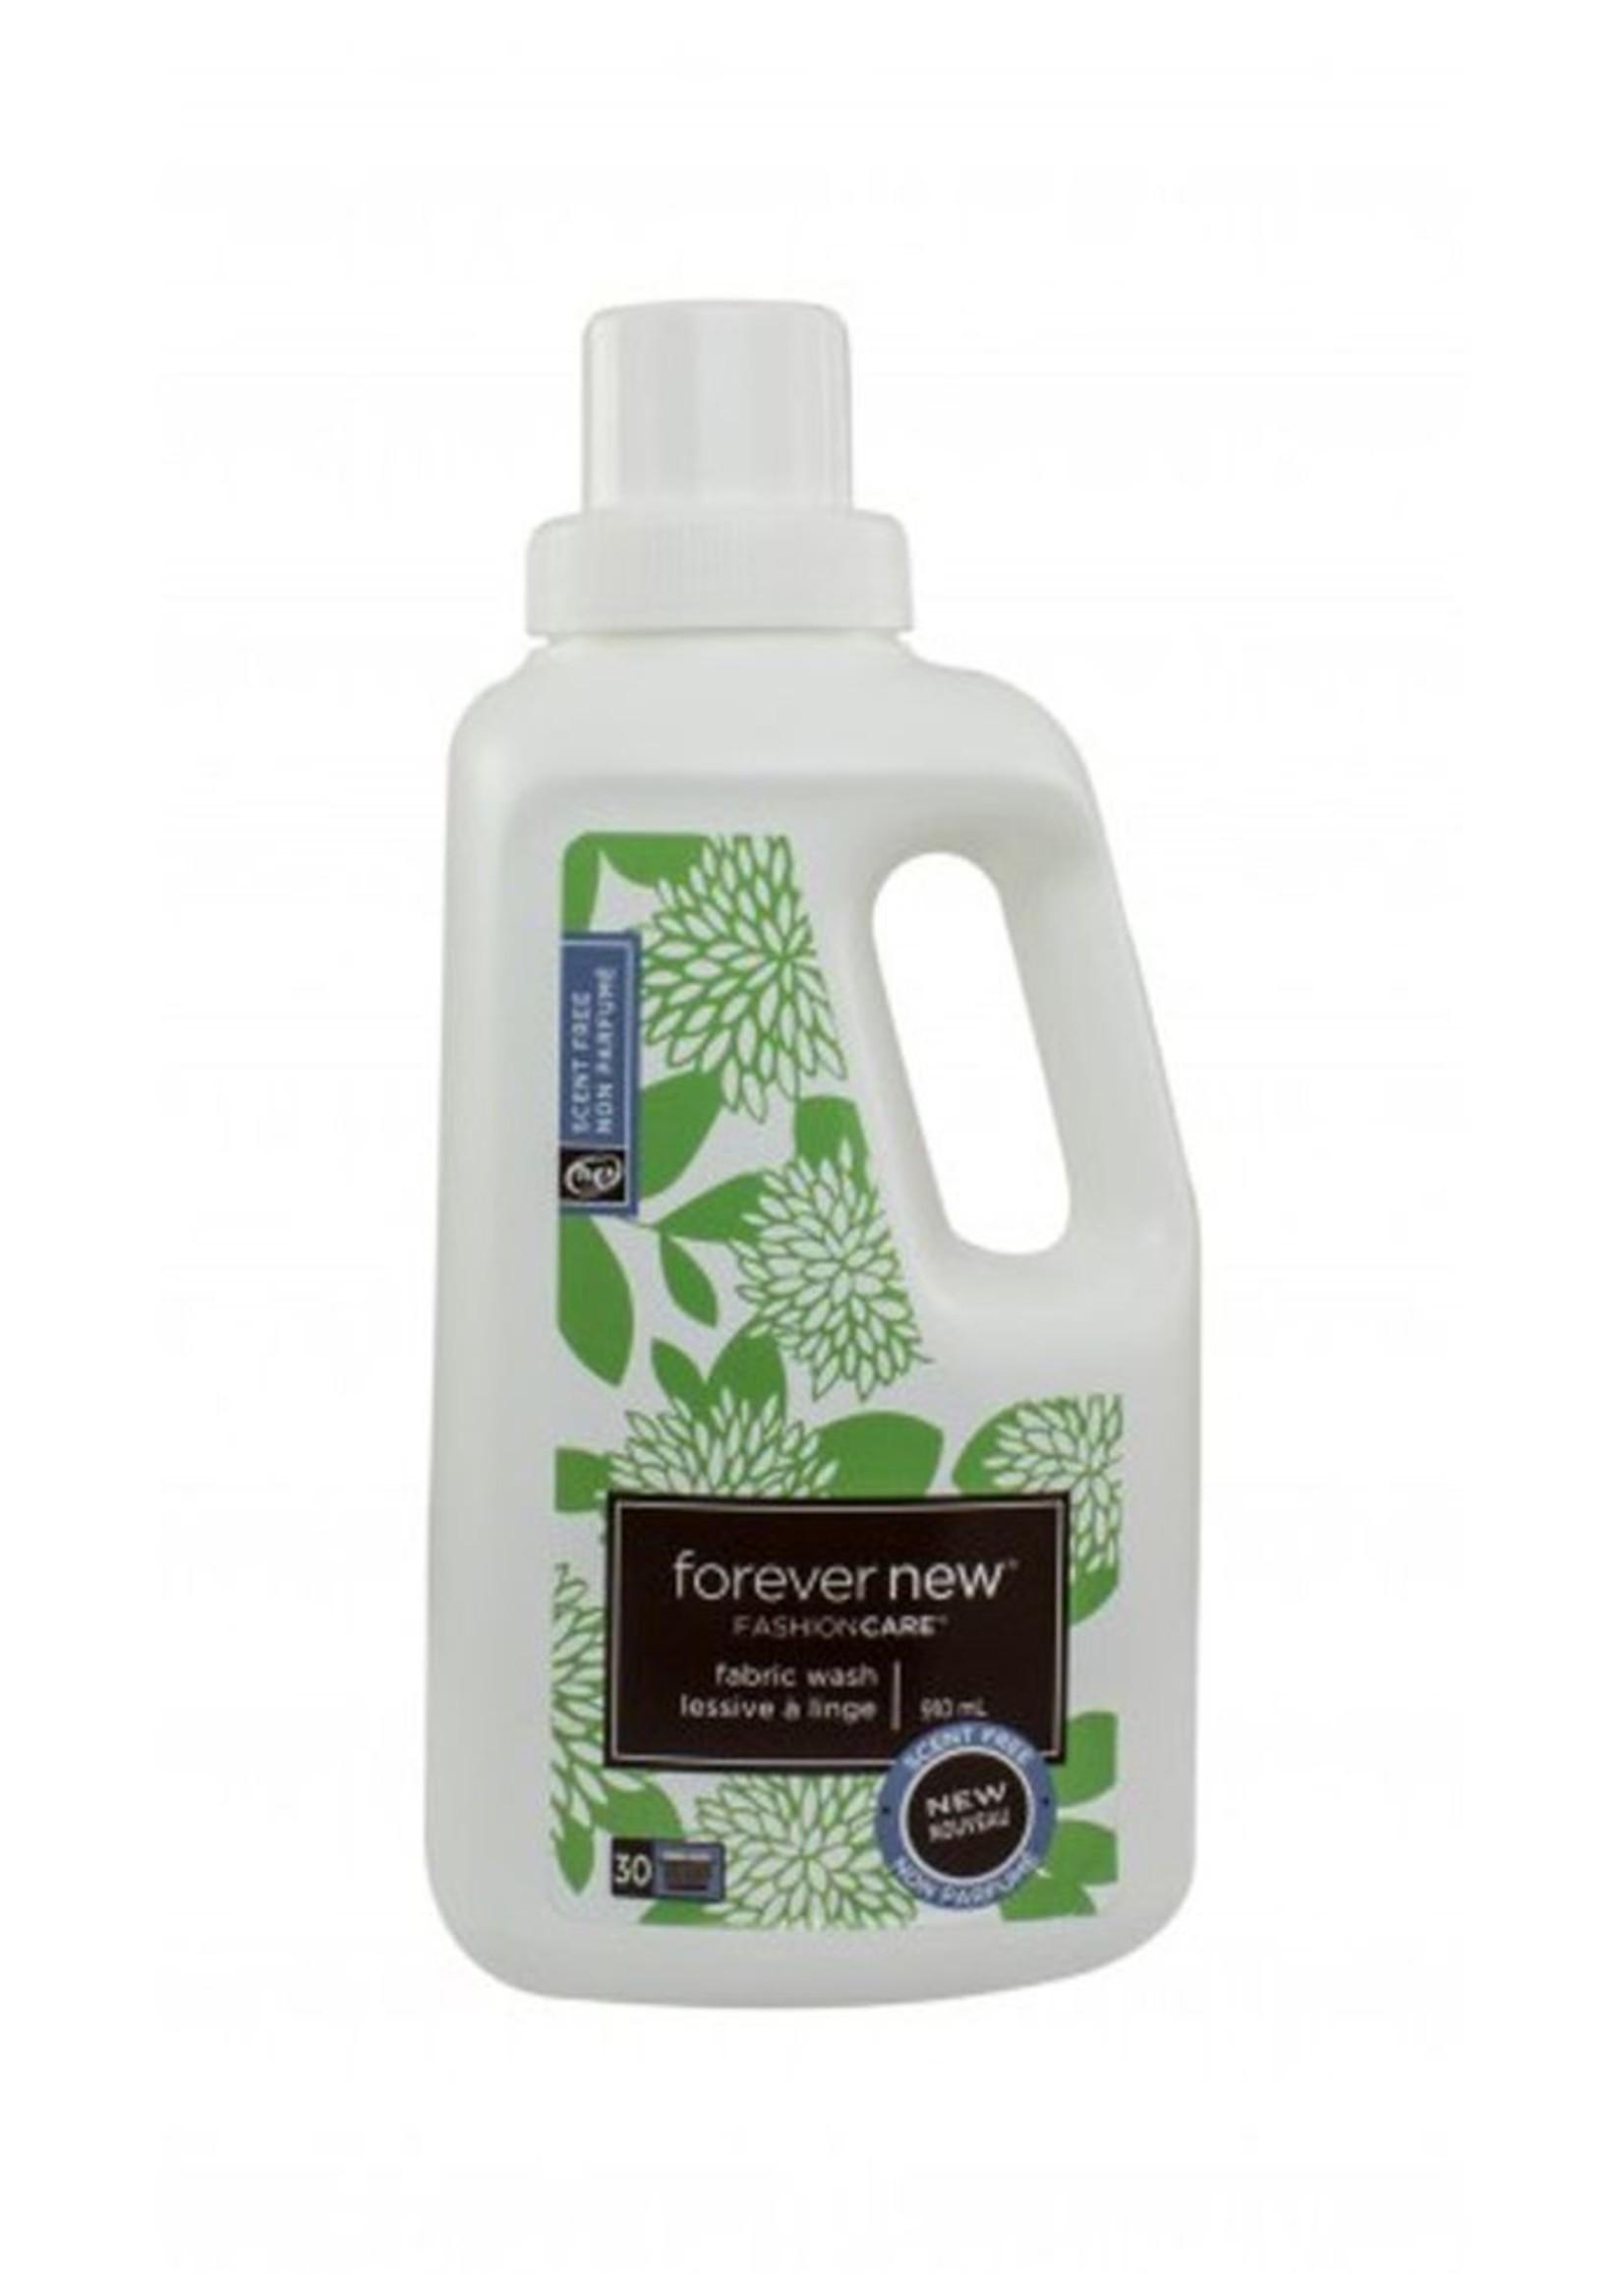 Forever New Unscented Liquid Detergent 910ml